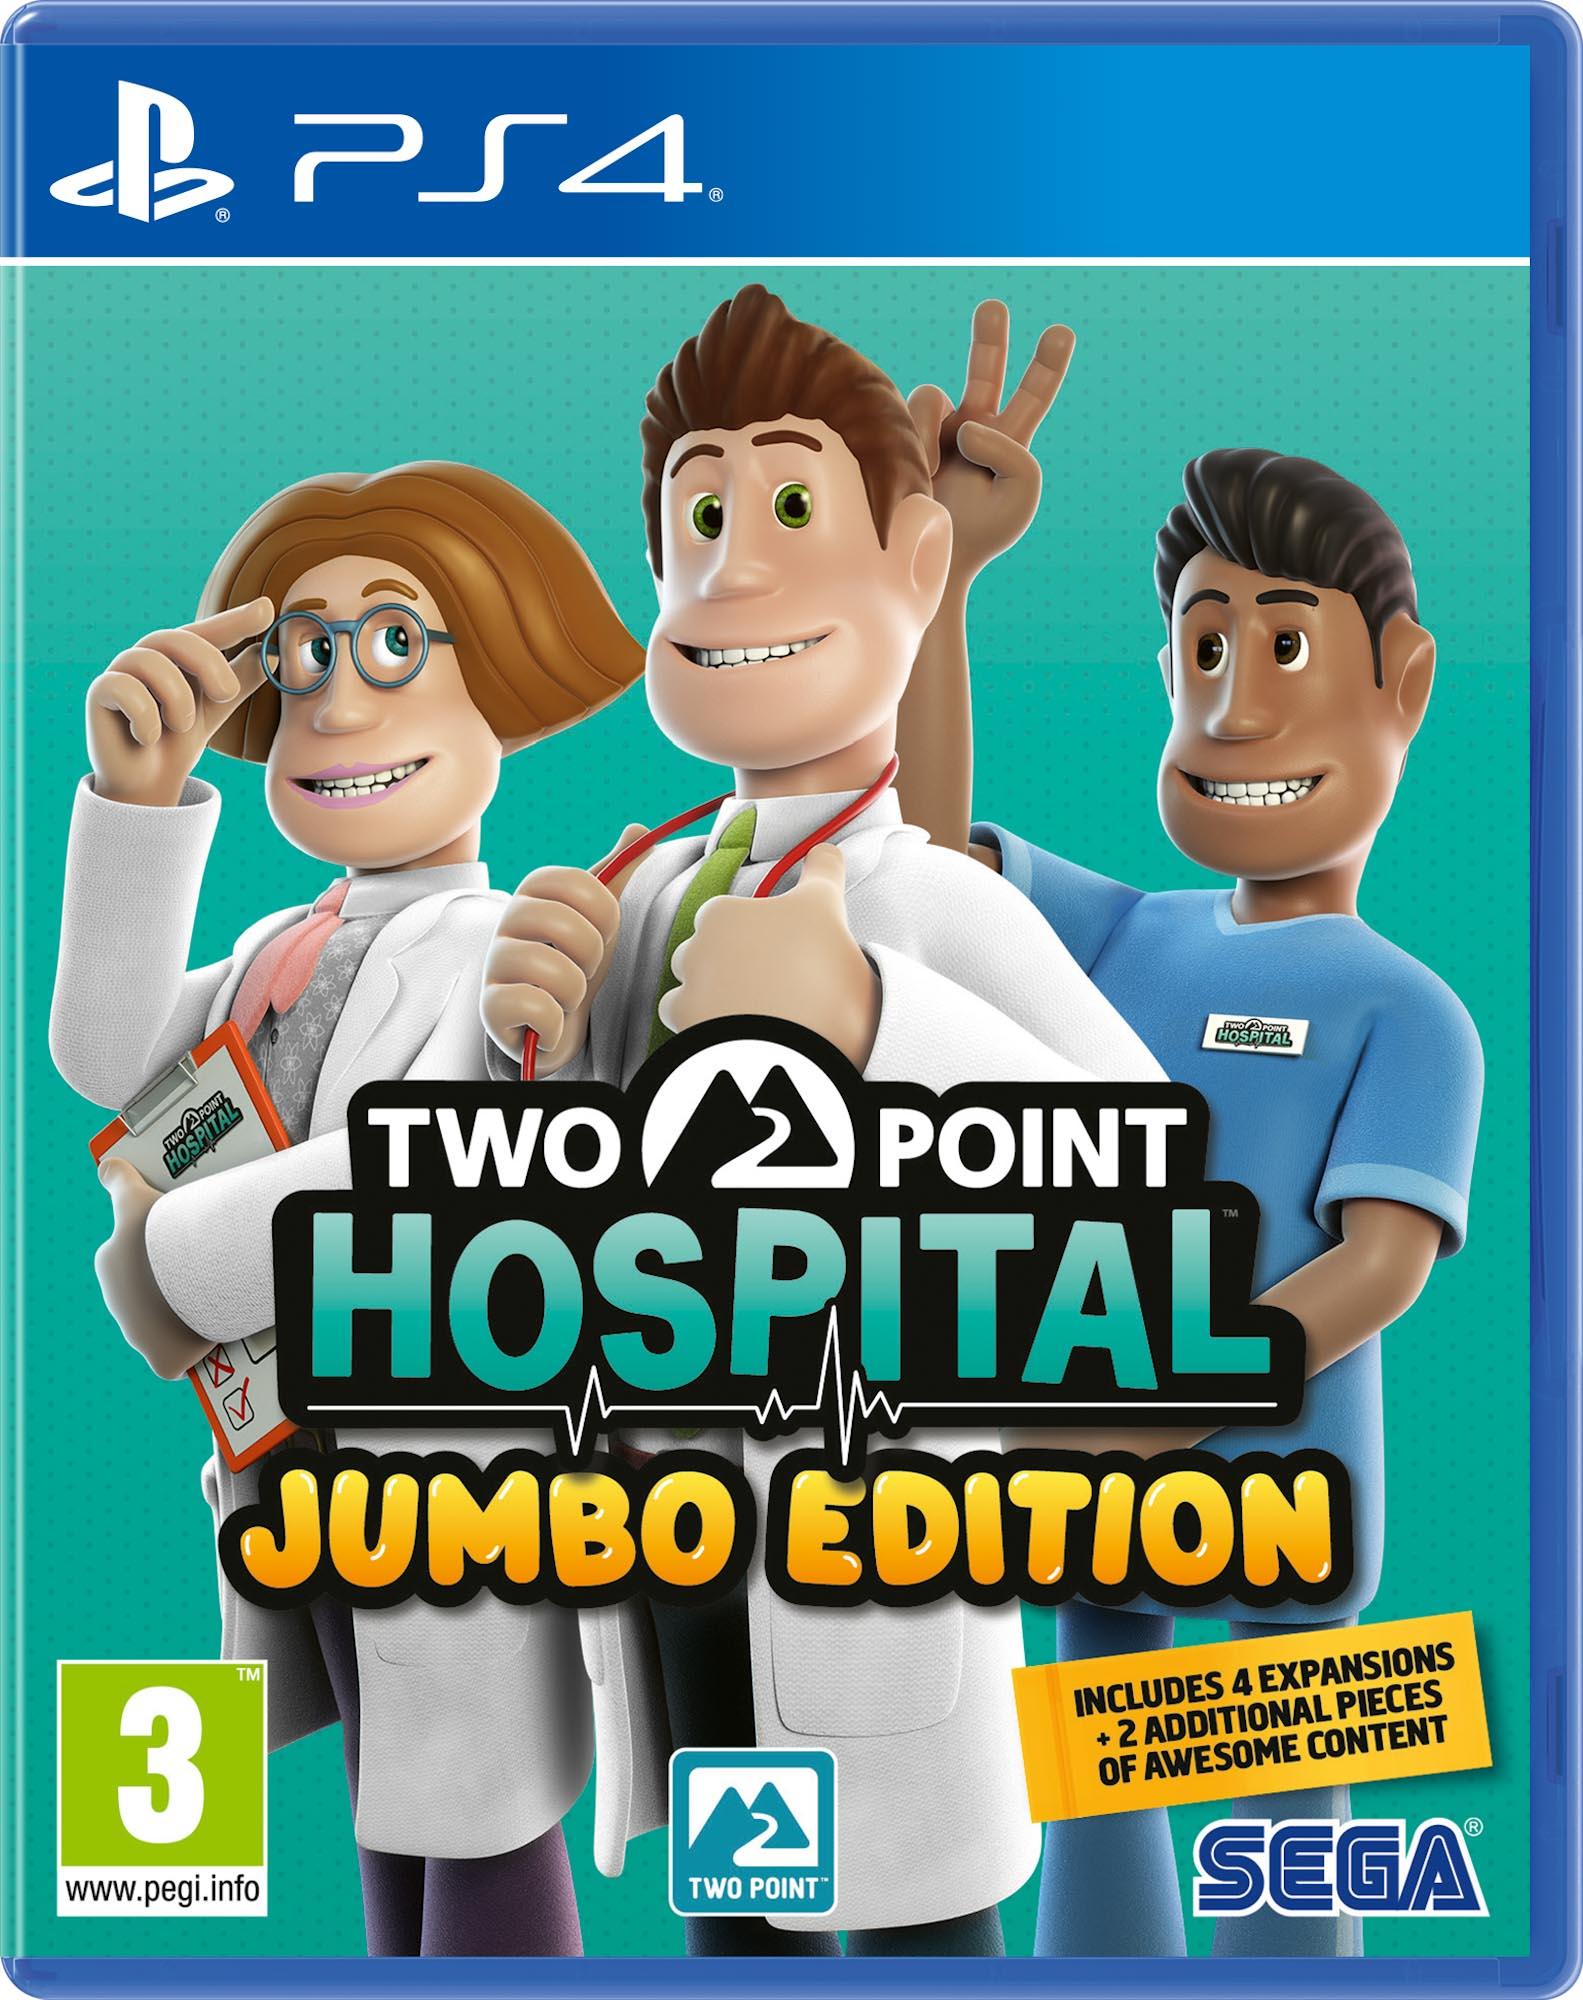 Two Point Hospital - Jumbo Edition PS4 - SEGA 1.12.01.21.013